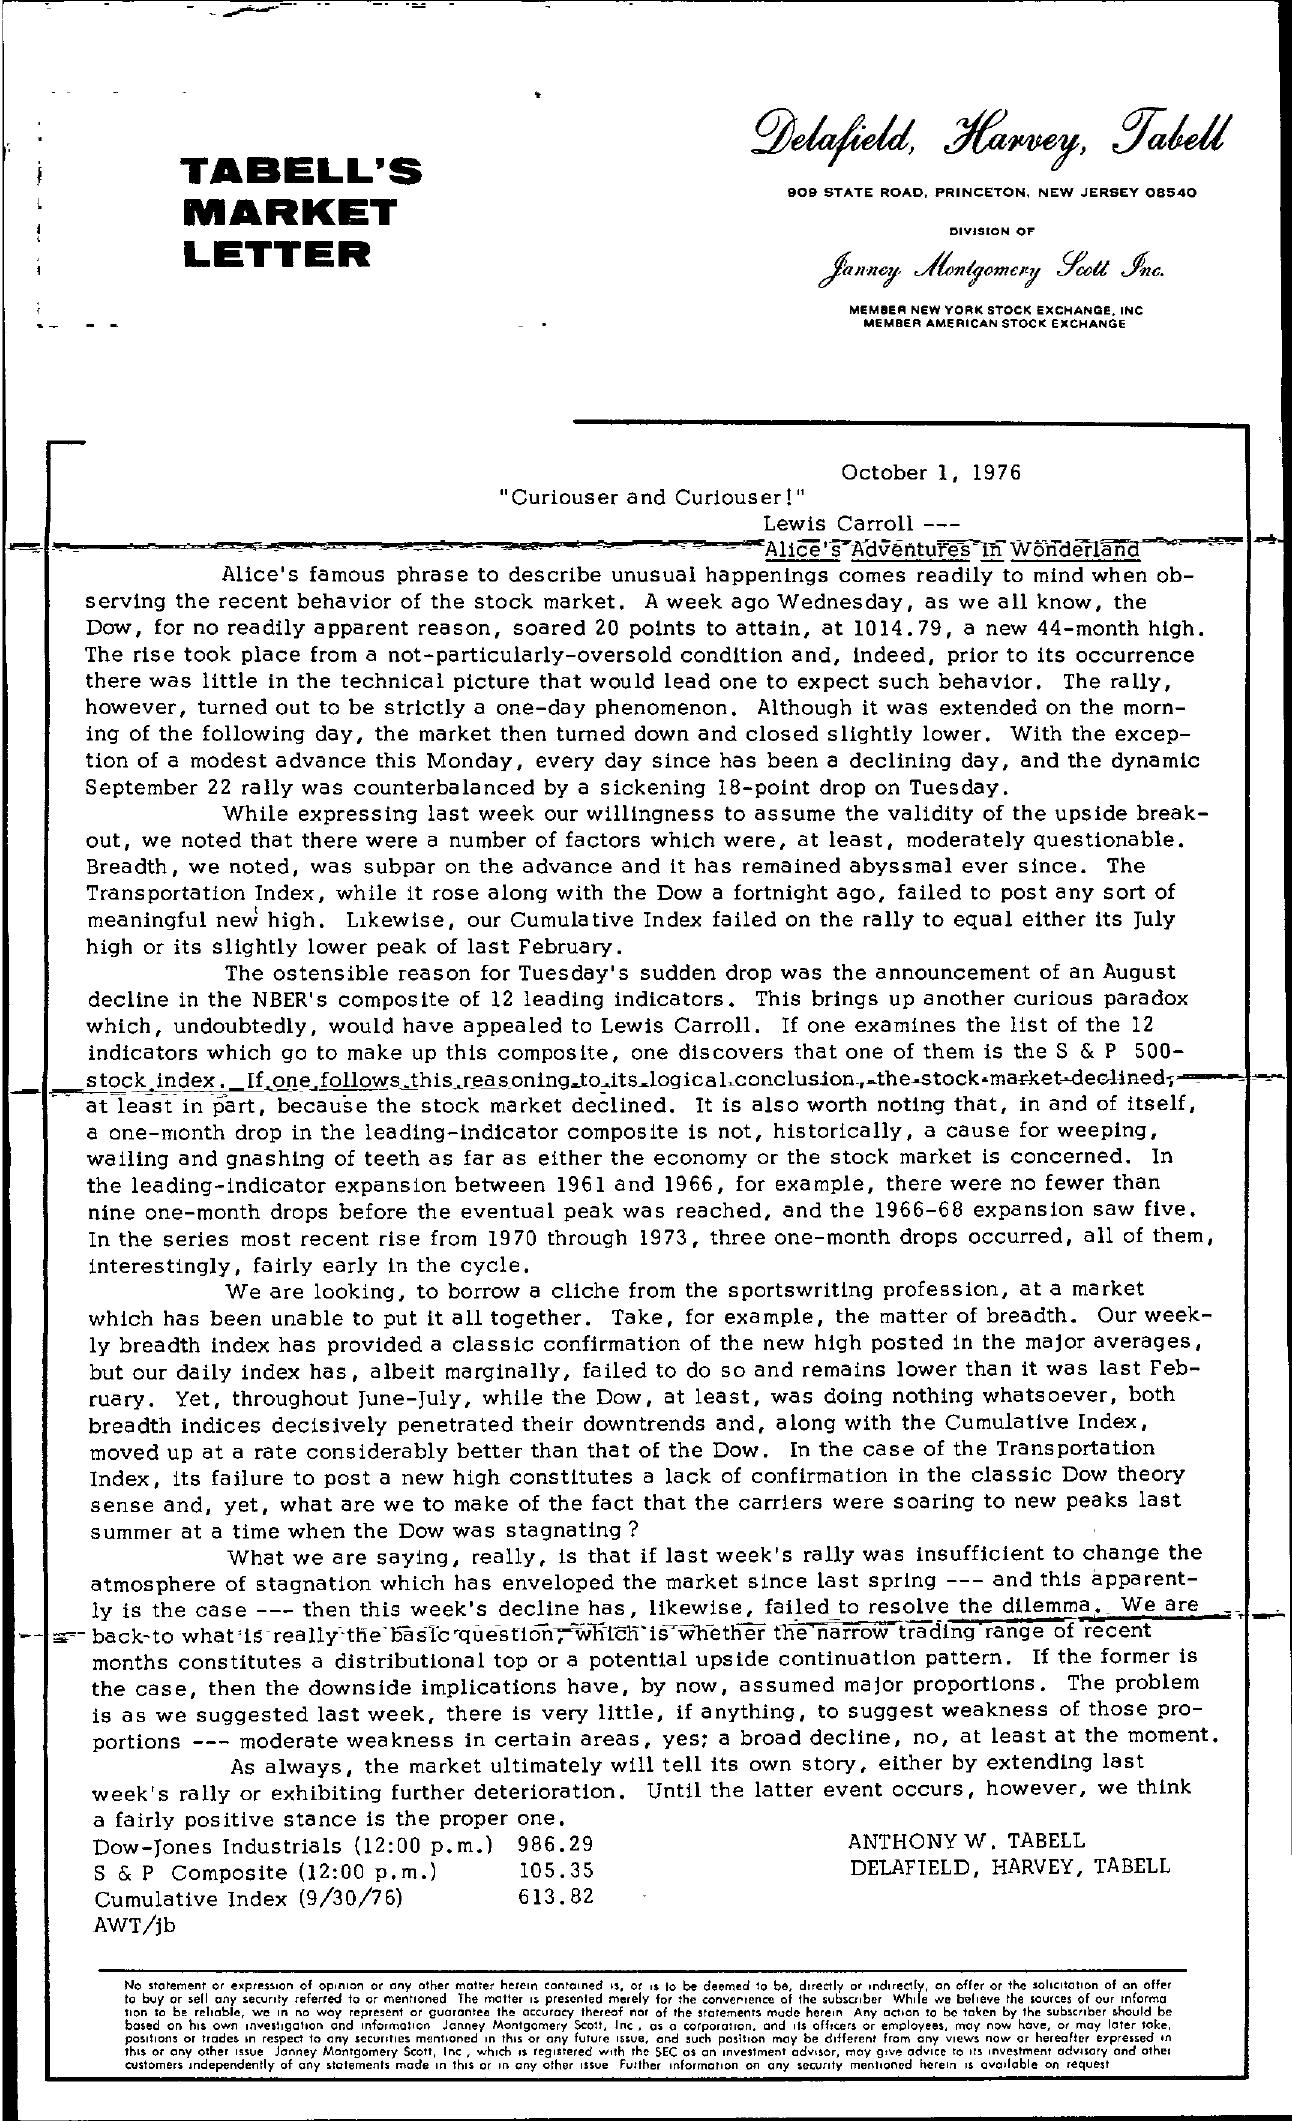 Tabell's Market Letter - October 01, 1976